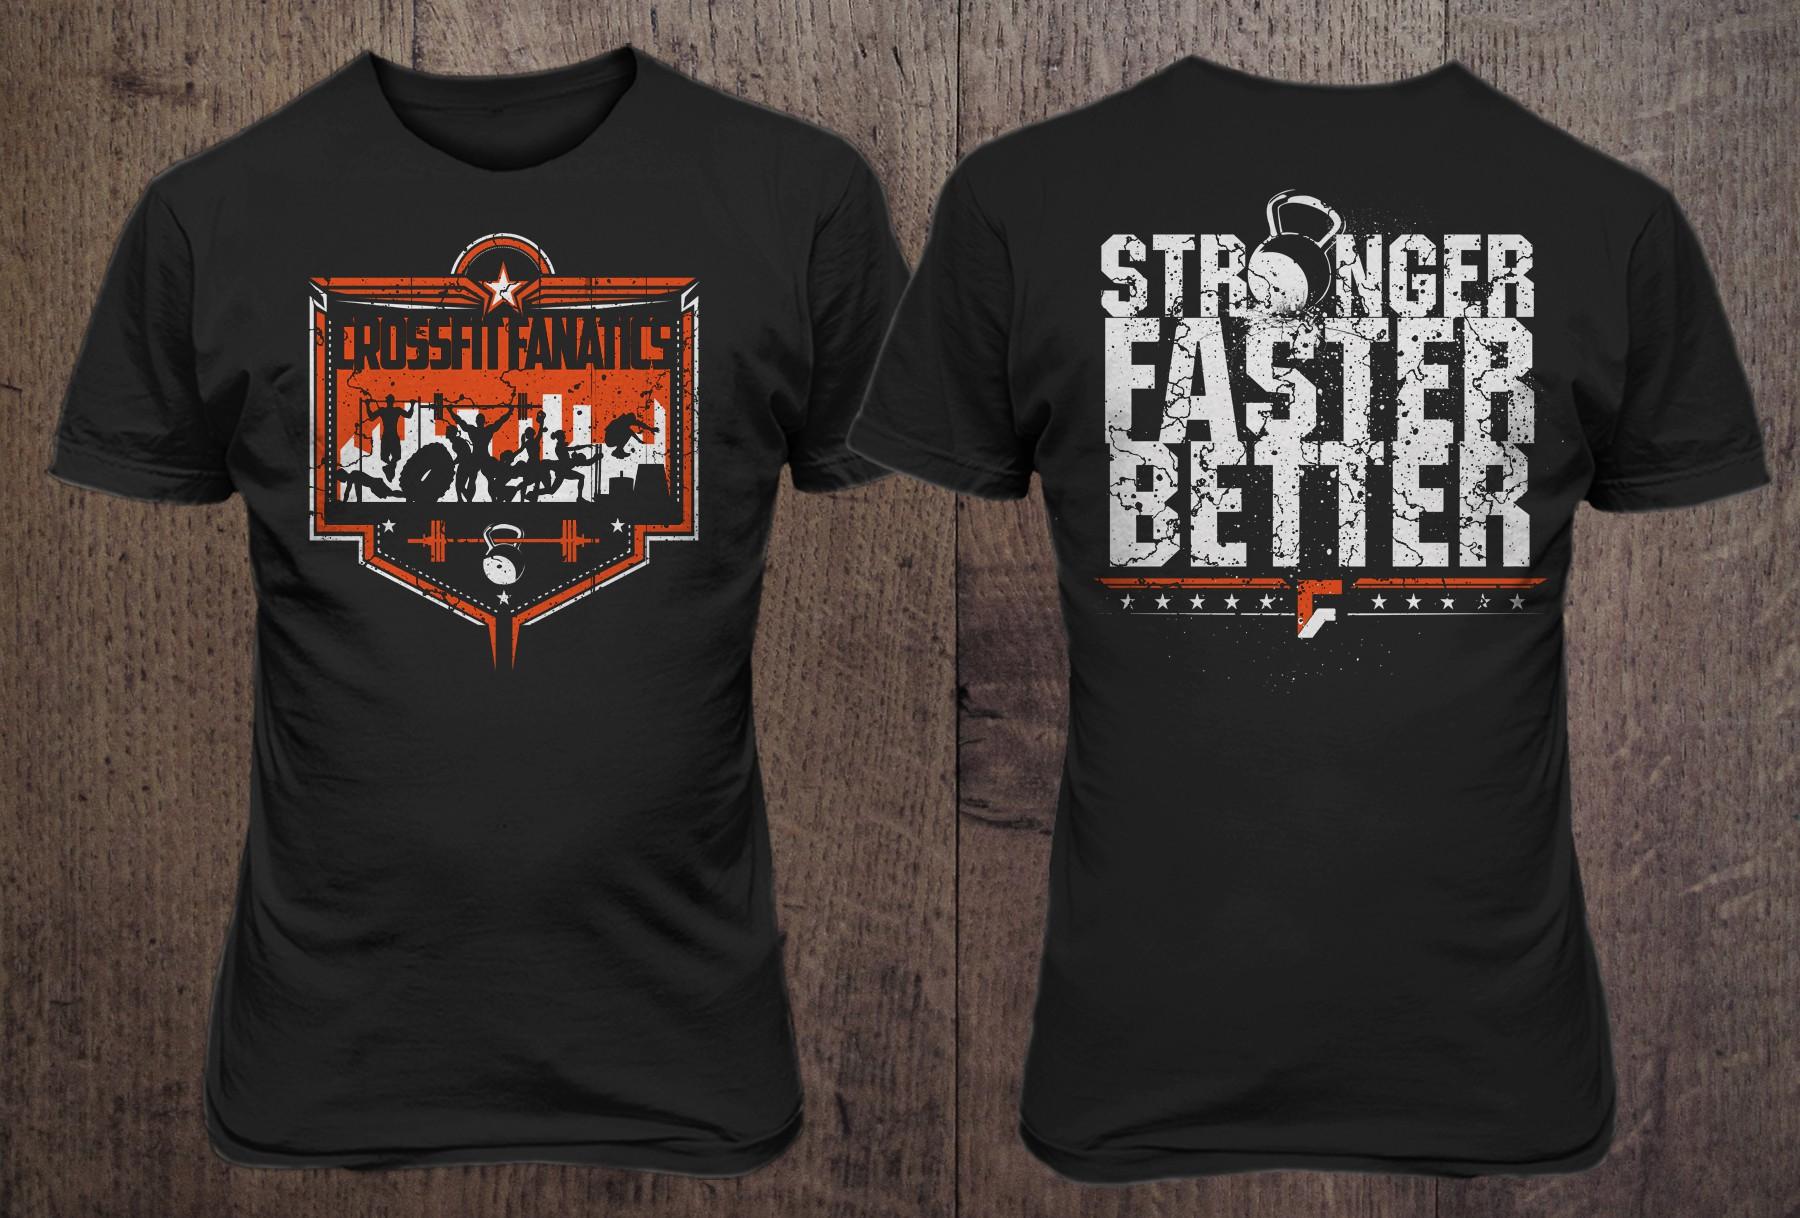 Crossfit Gym Needs Creative T Shirt Design